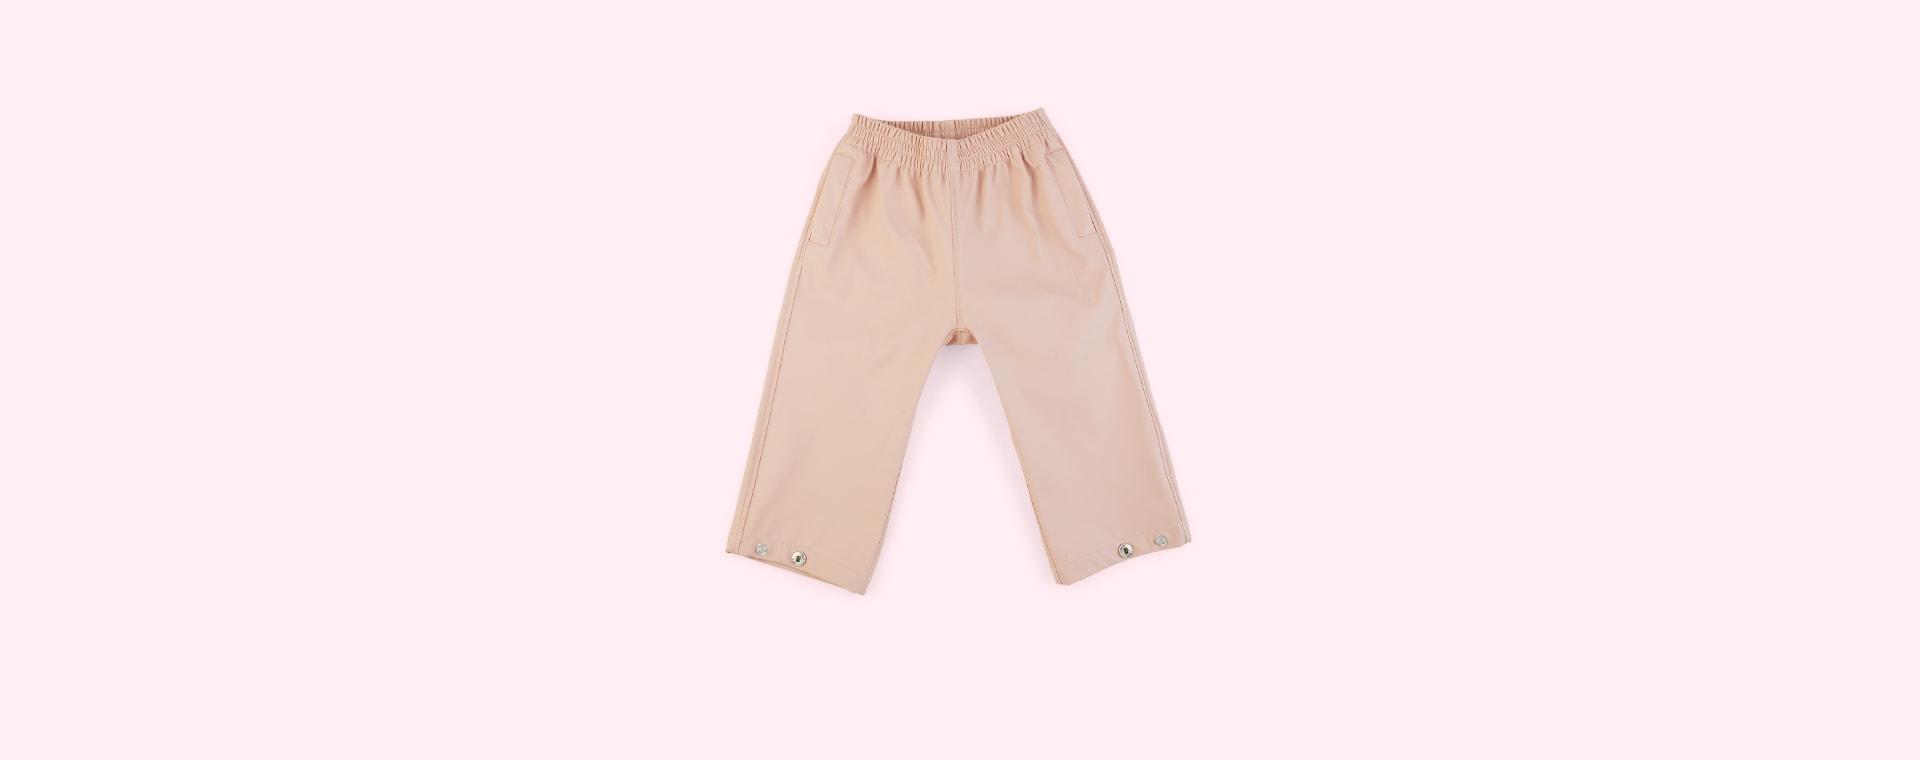 Evening Pink GOSOAKY Unisex Waterproof Rain Pants